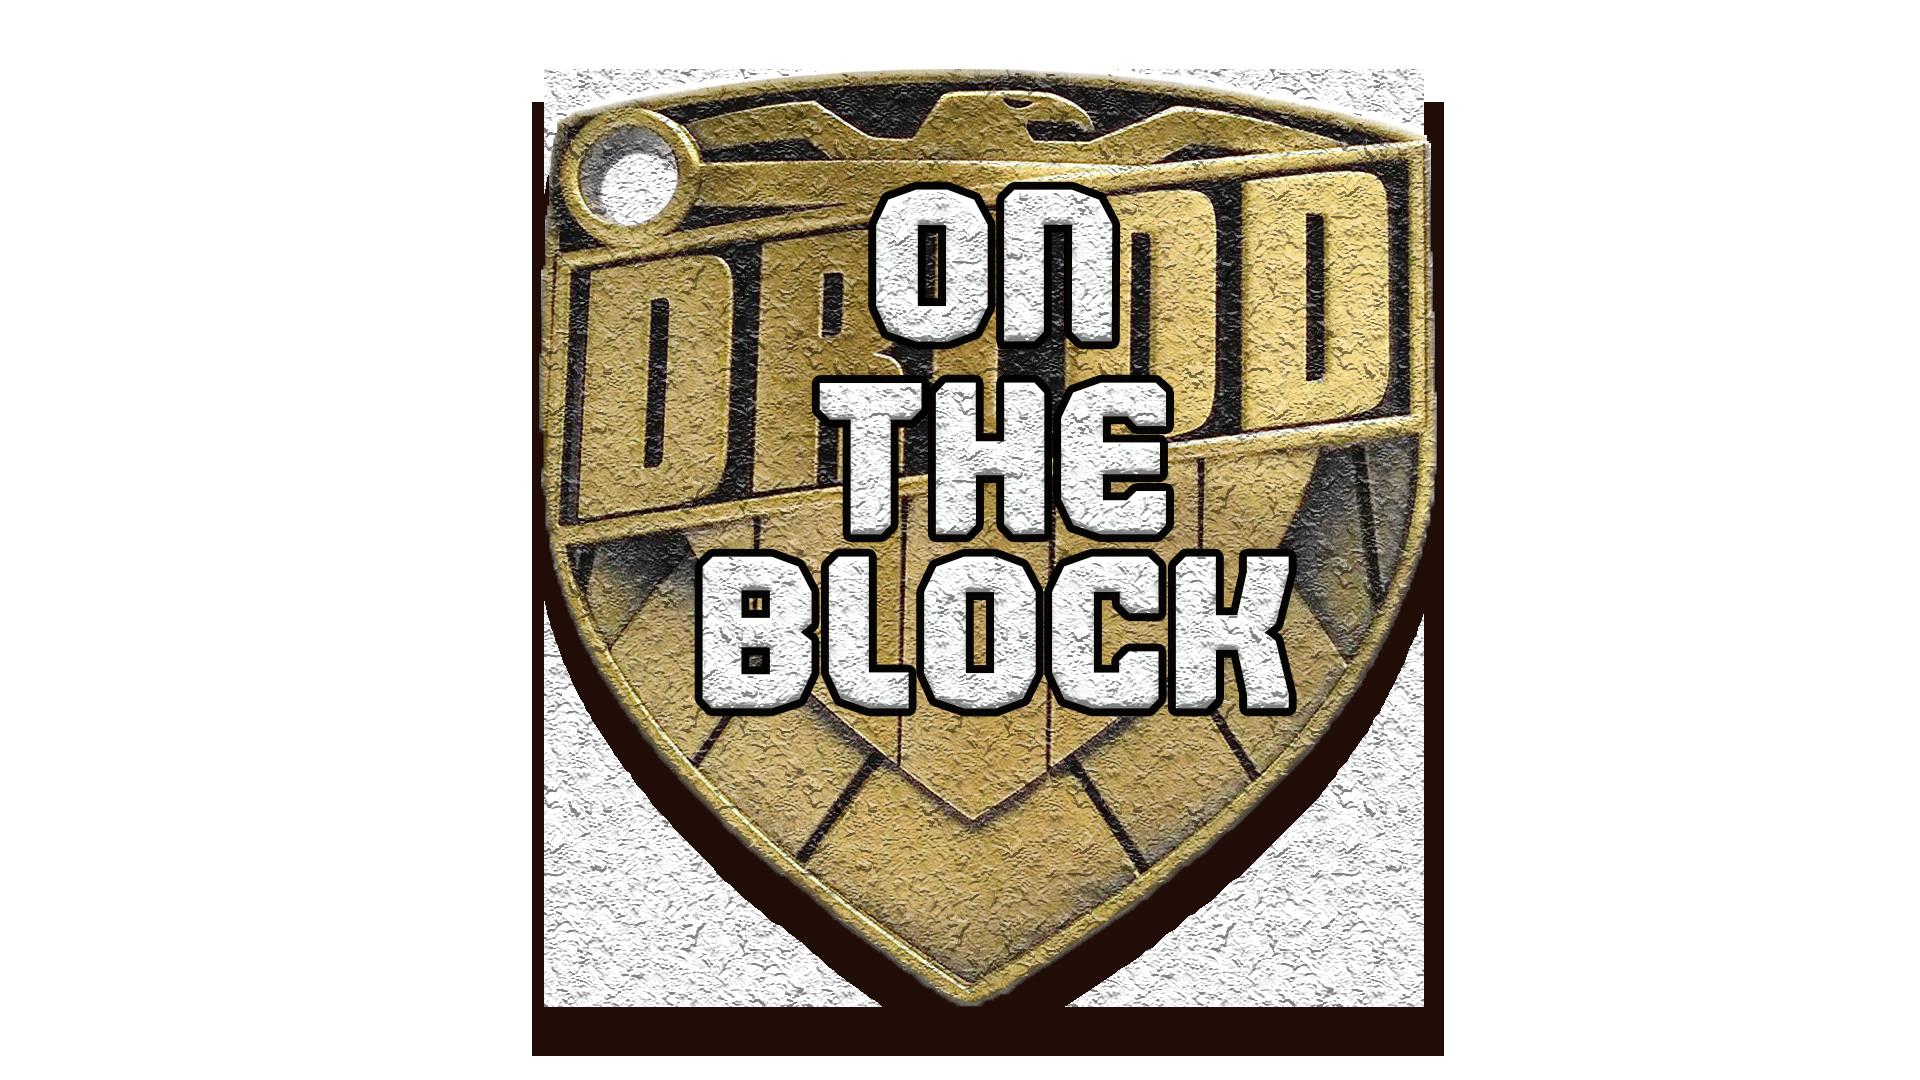 Episode 2 - Judge Dredd: On The Block show art